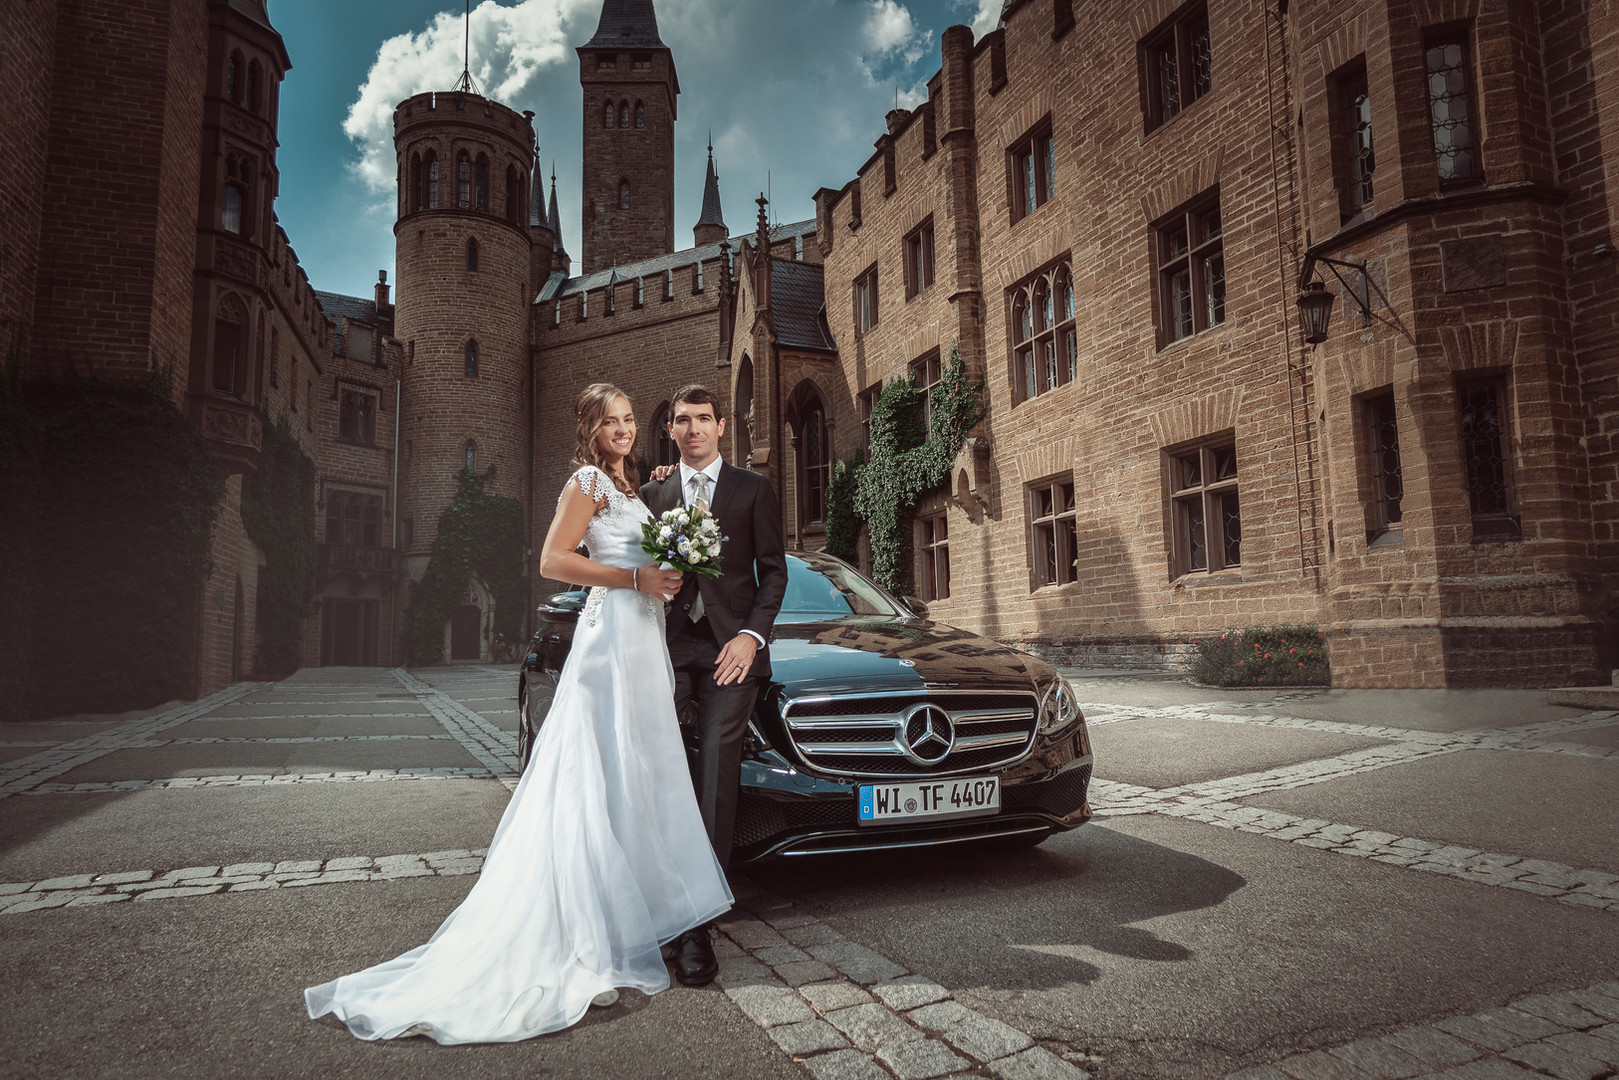 Wedding in Germany